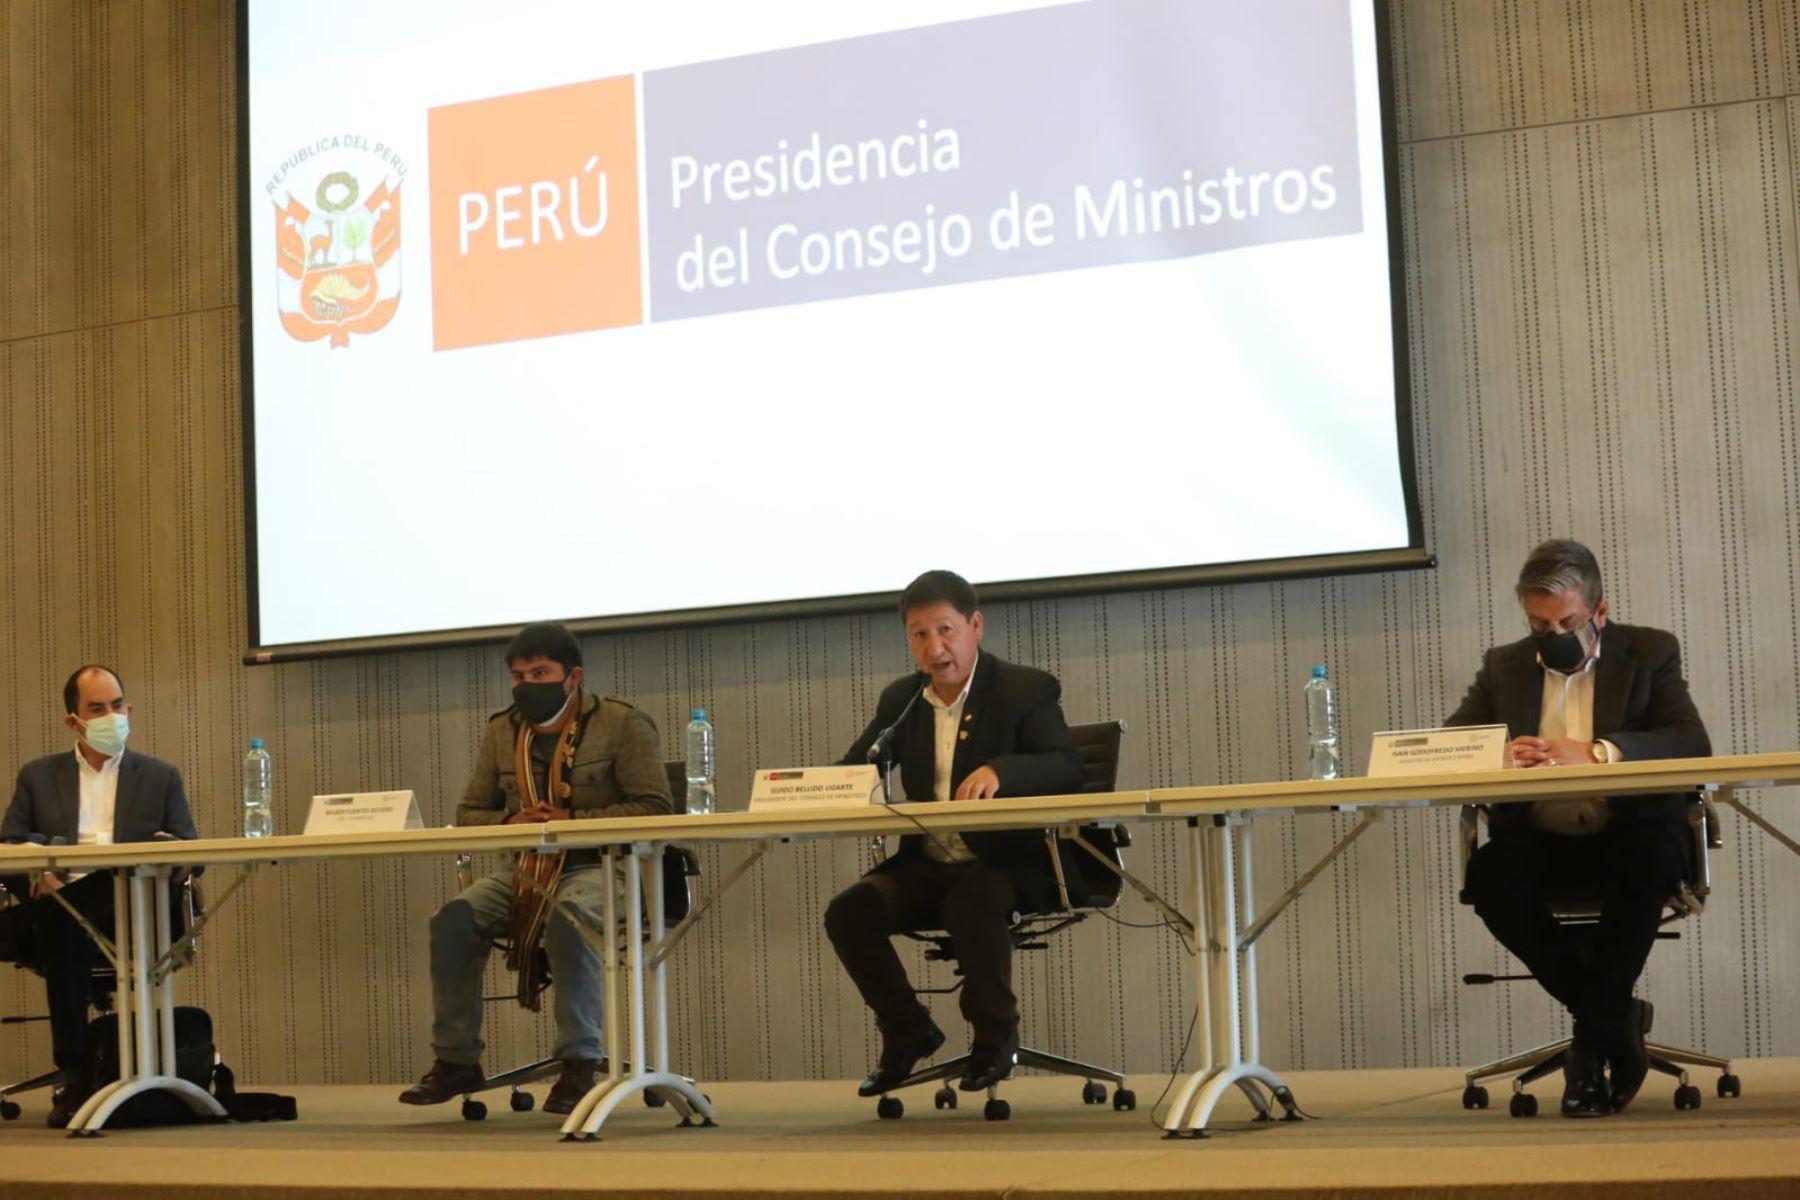 Gobierno se reunió con representantes de Chumbivilcas y Las Bambas para retomar diálogo